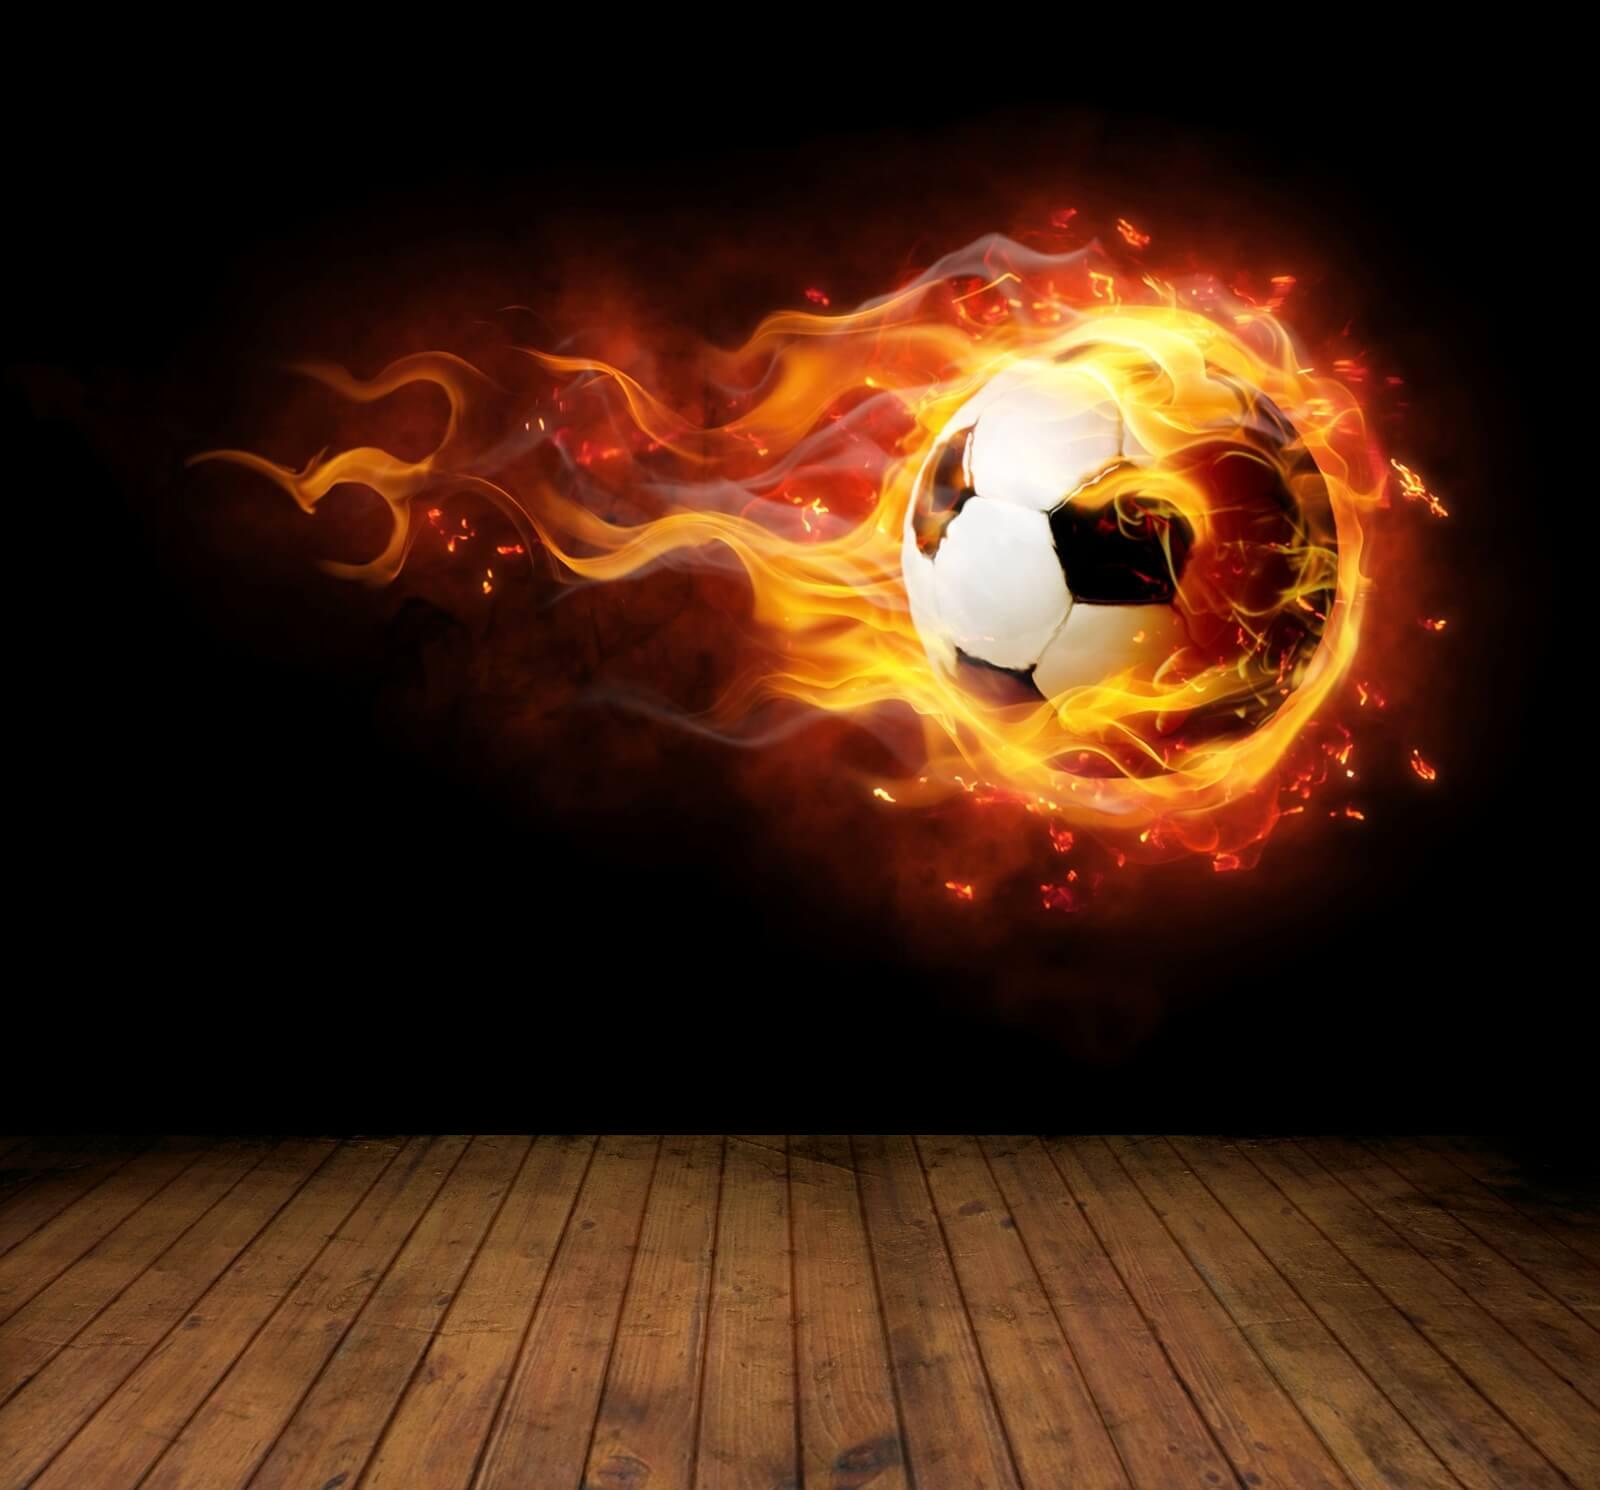 Vlies Xxl Poster Fototapete Tapete Flammen Burn Fussball In Flammen